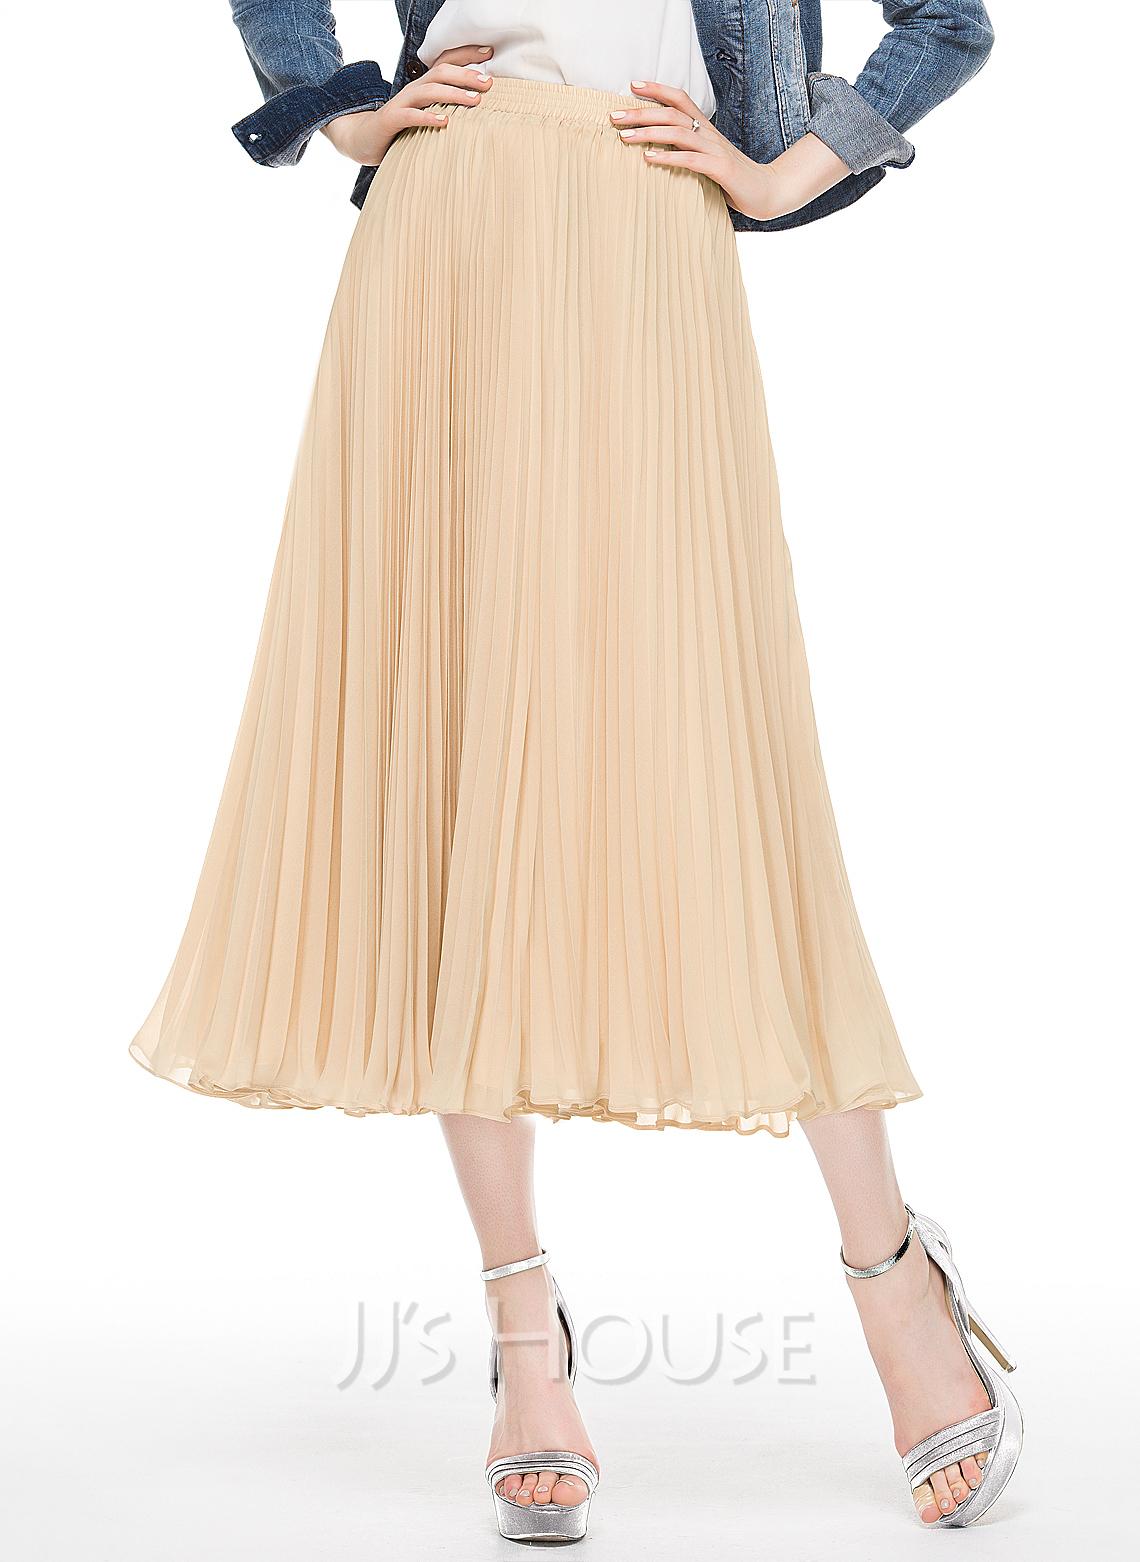 A-Line/Princess Tea-Length Chiffon Cocktail Skirt With Pleated